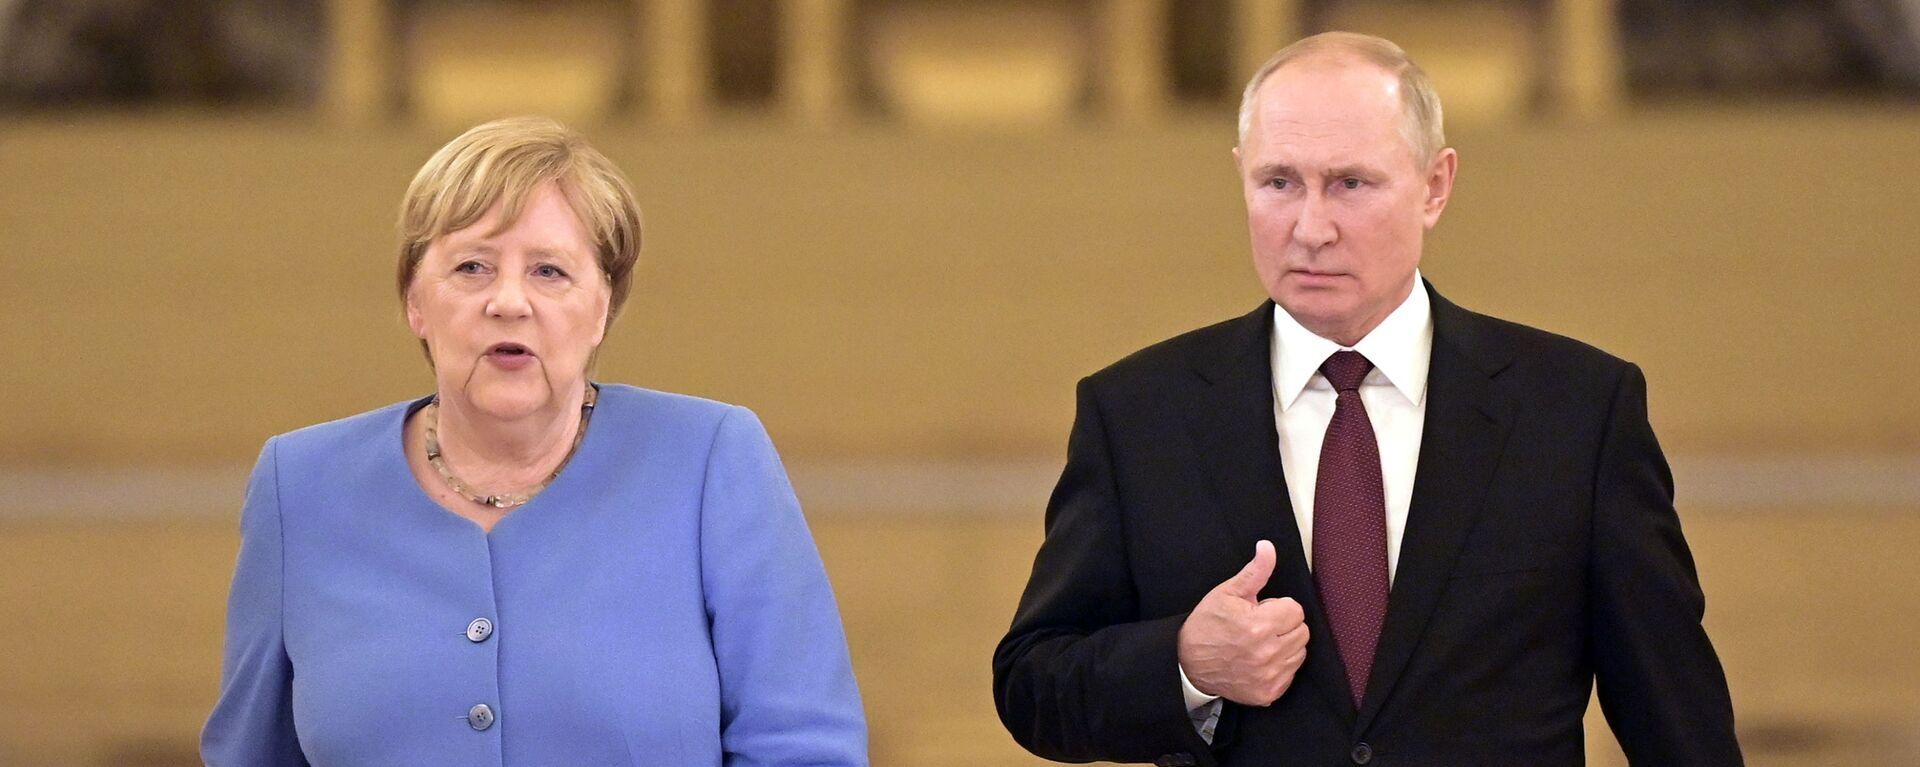 Angela Merkel e Vladimir Putin - Sputnik Italia, 1920, 20.08.2021